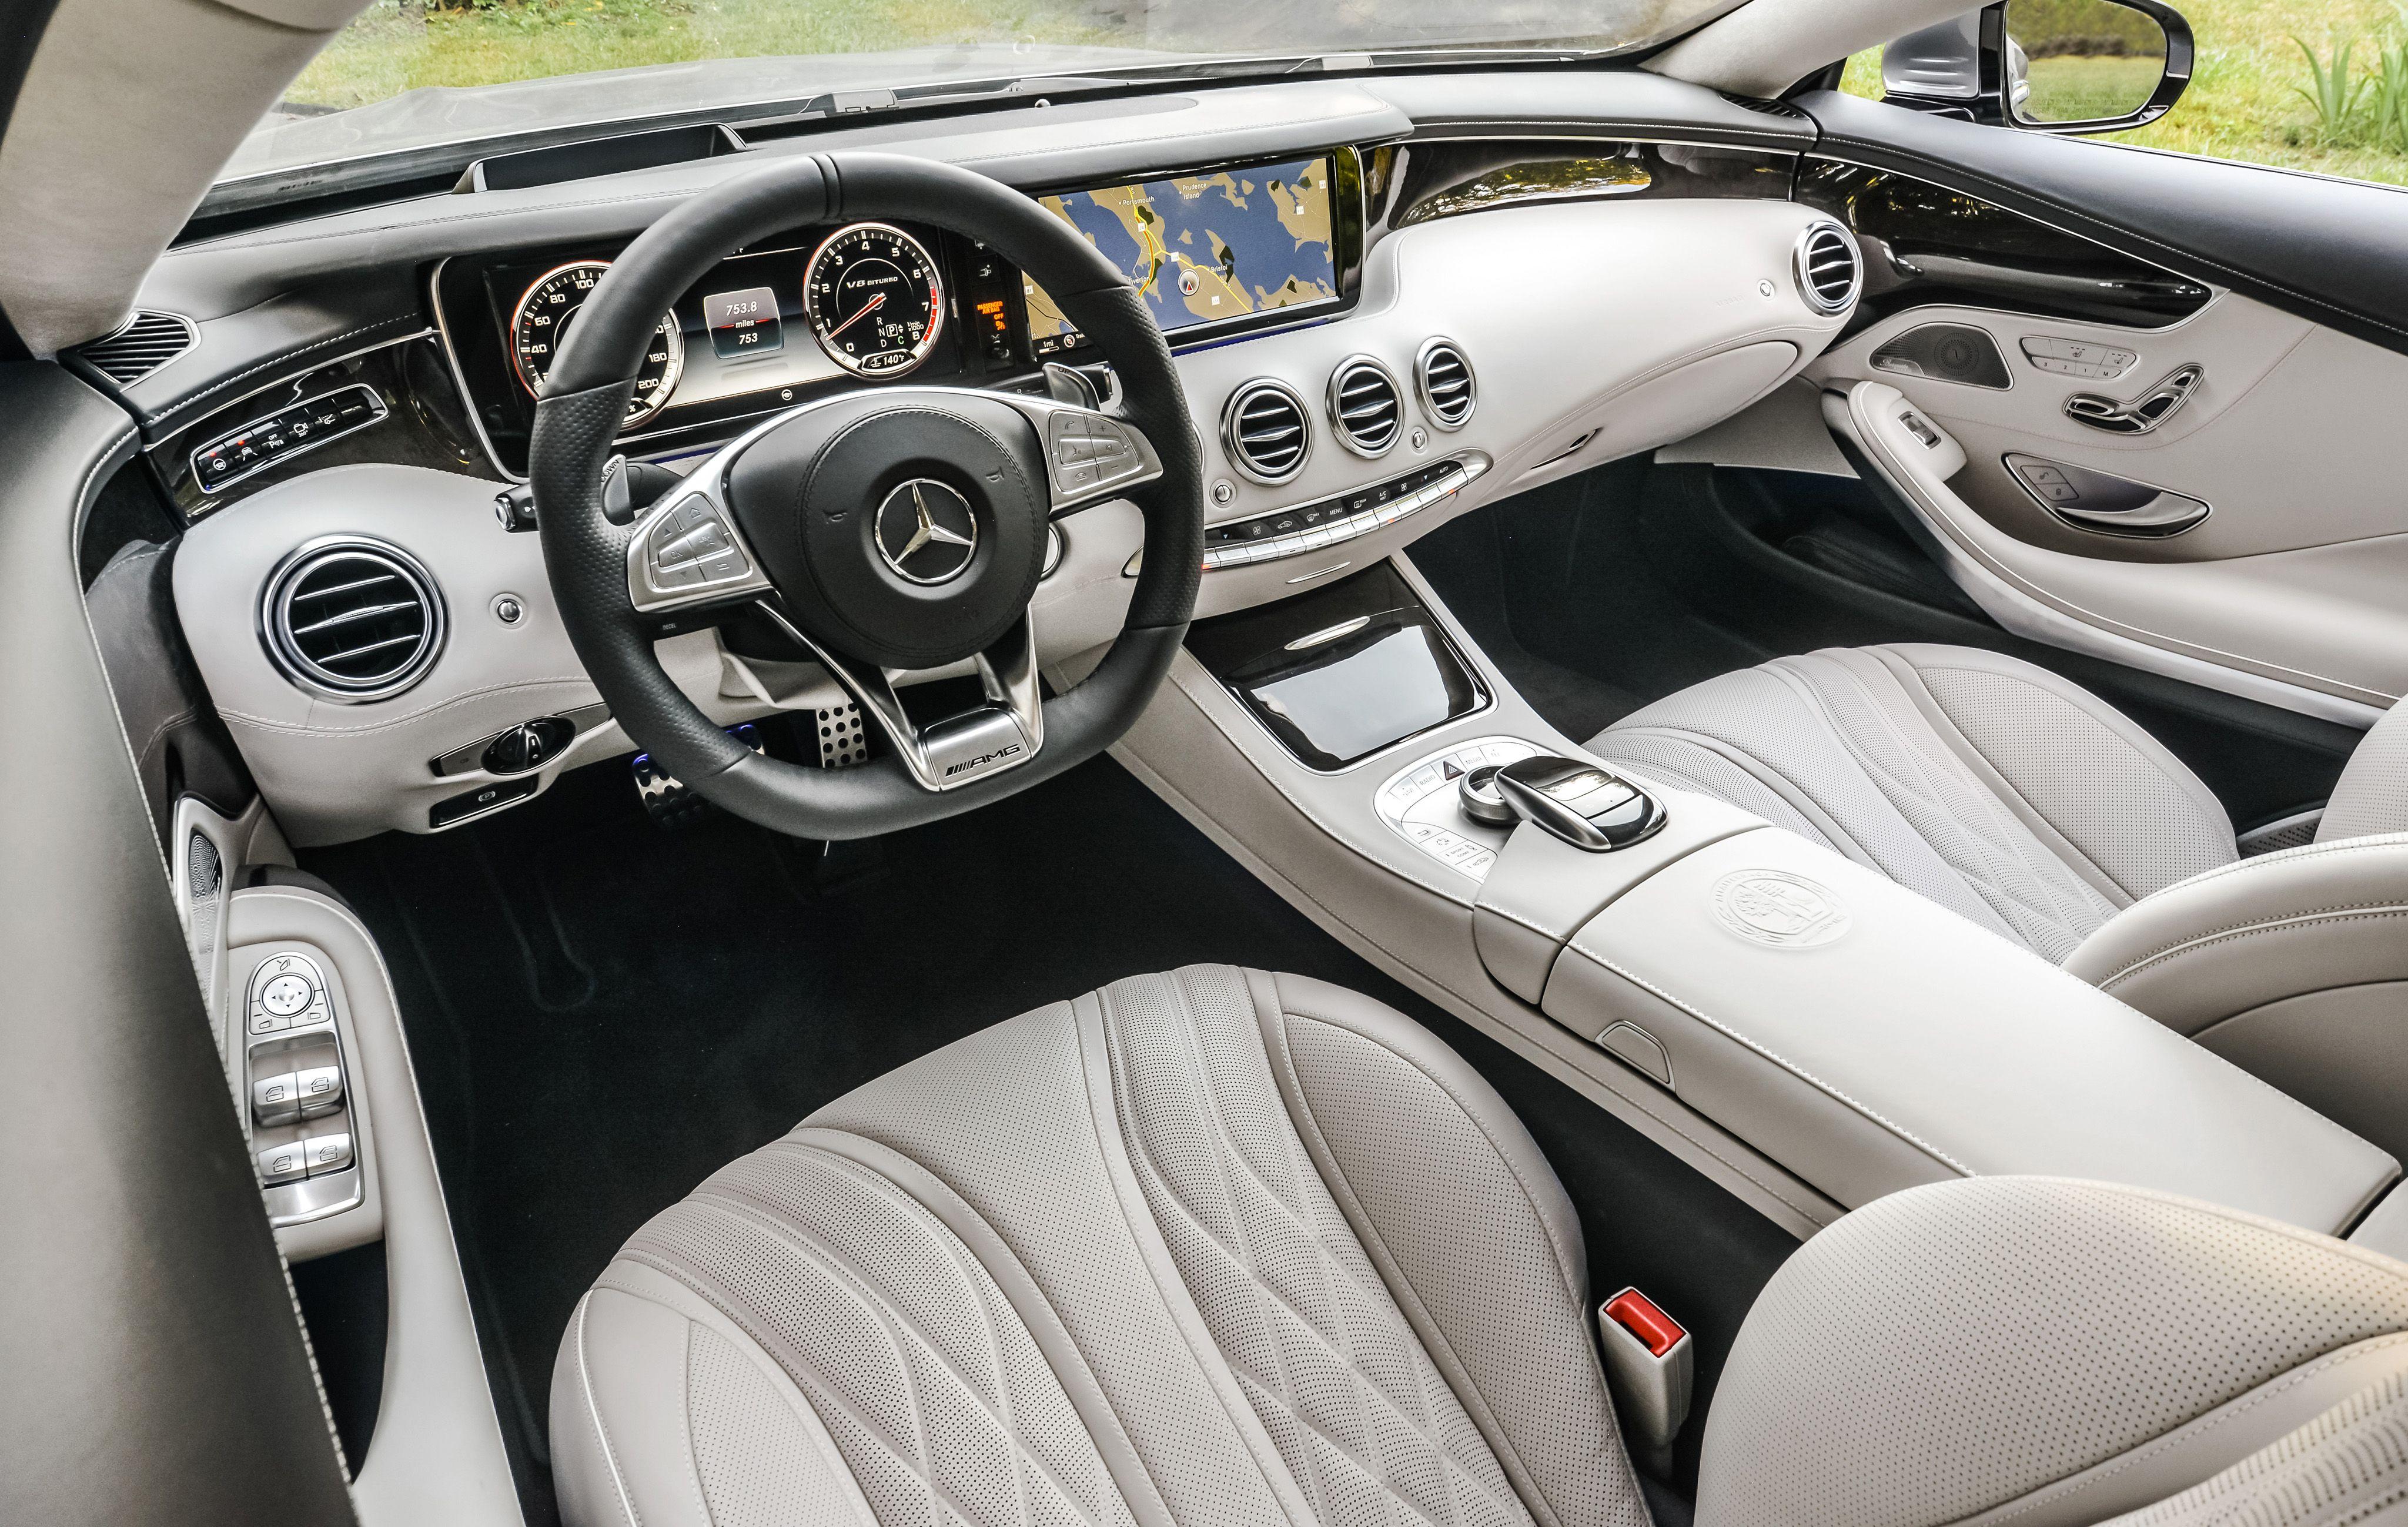 Pin By Entrepreneur Millionaire On Whips Pinterest Mercedes Benz